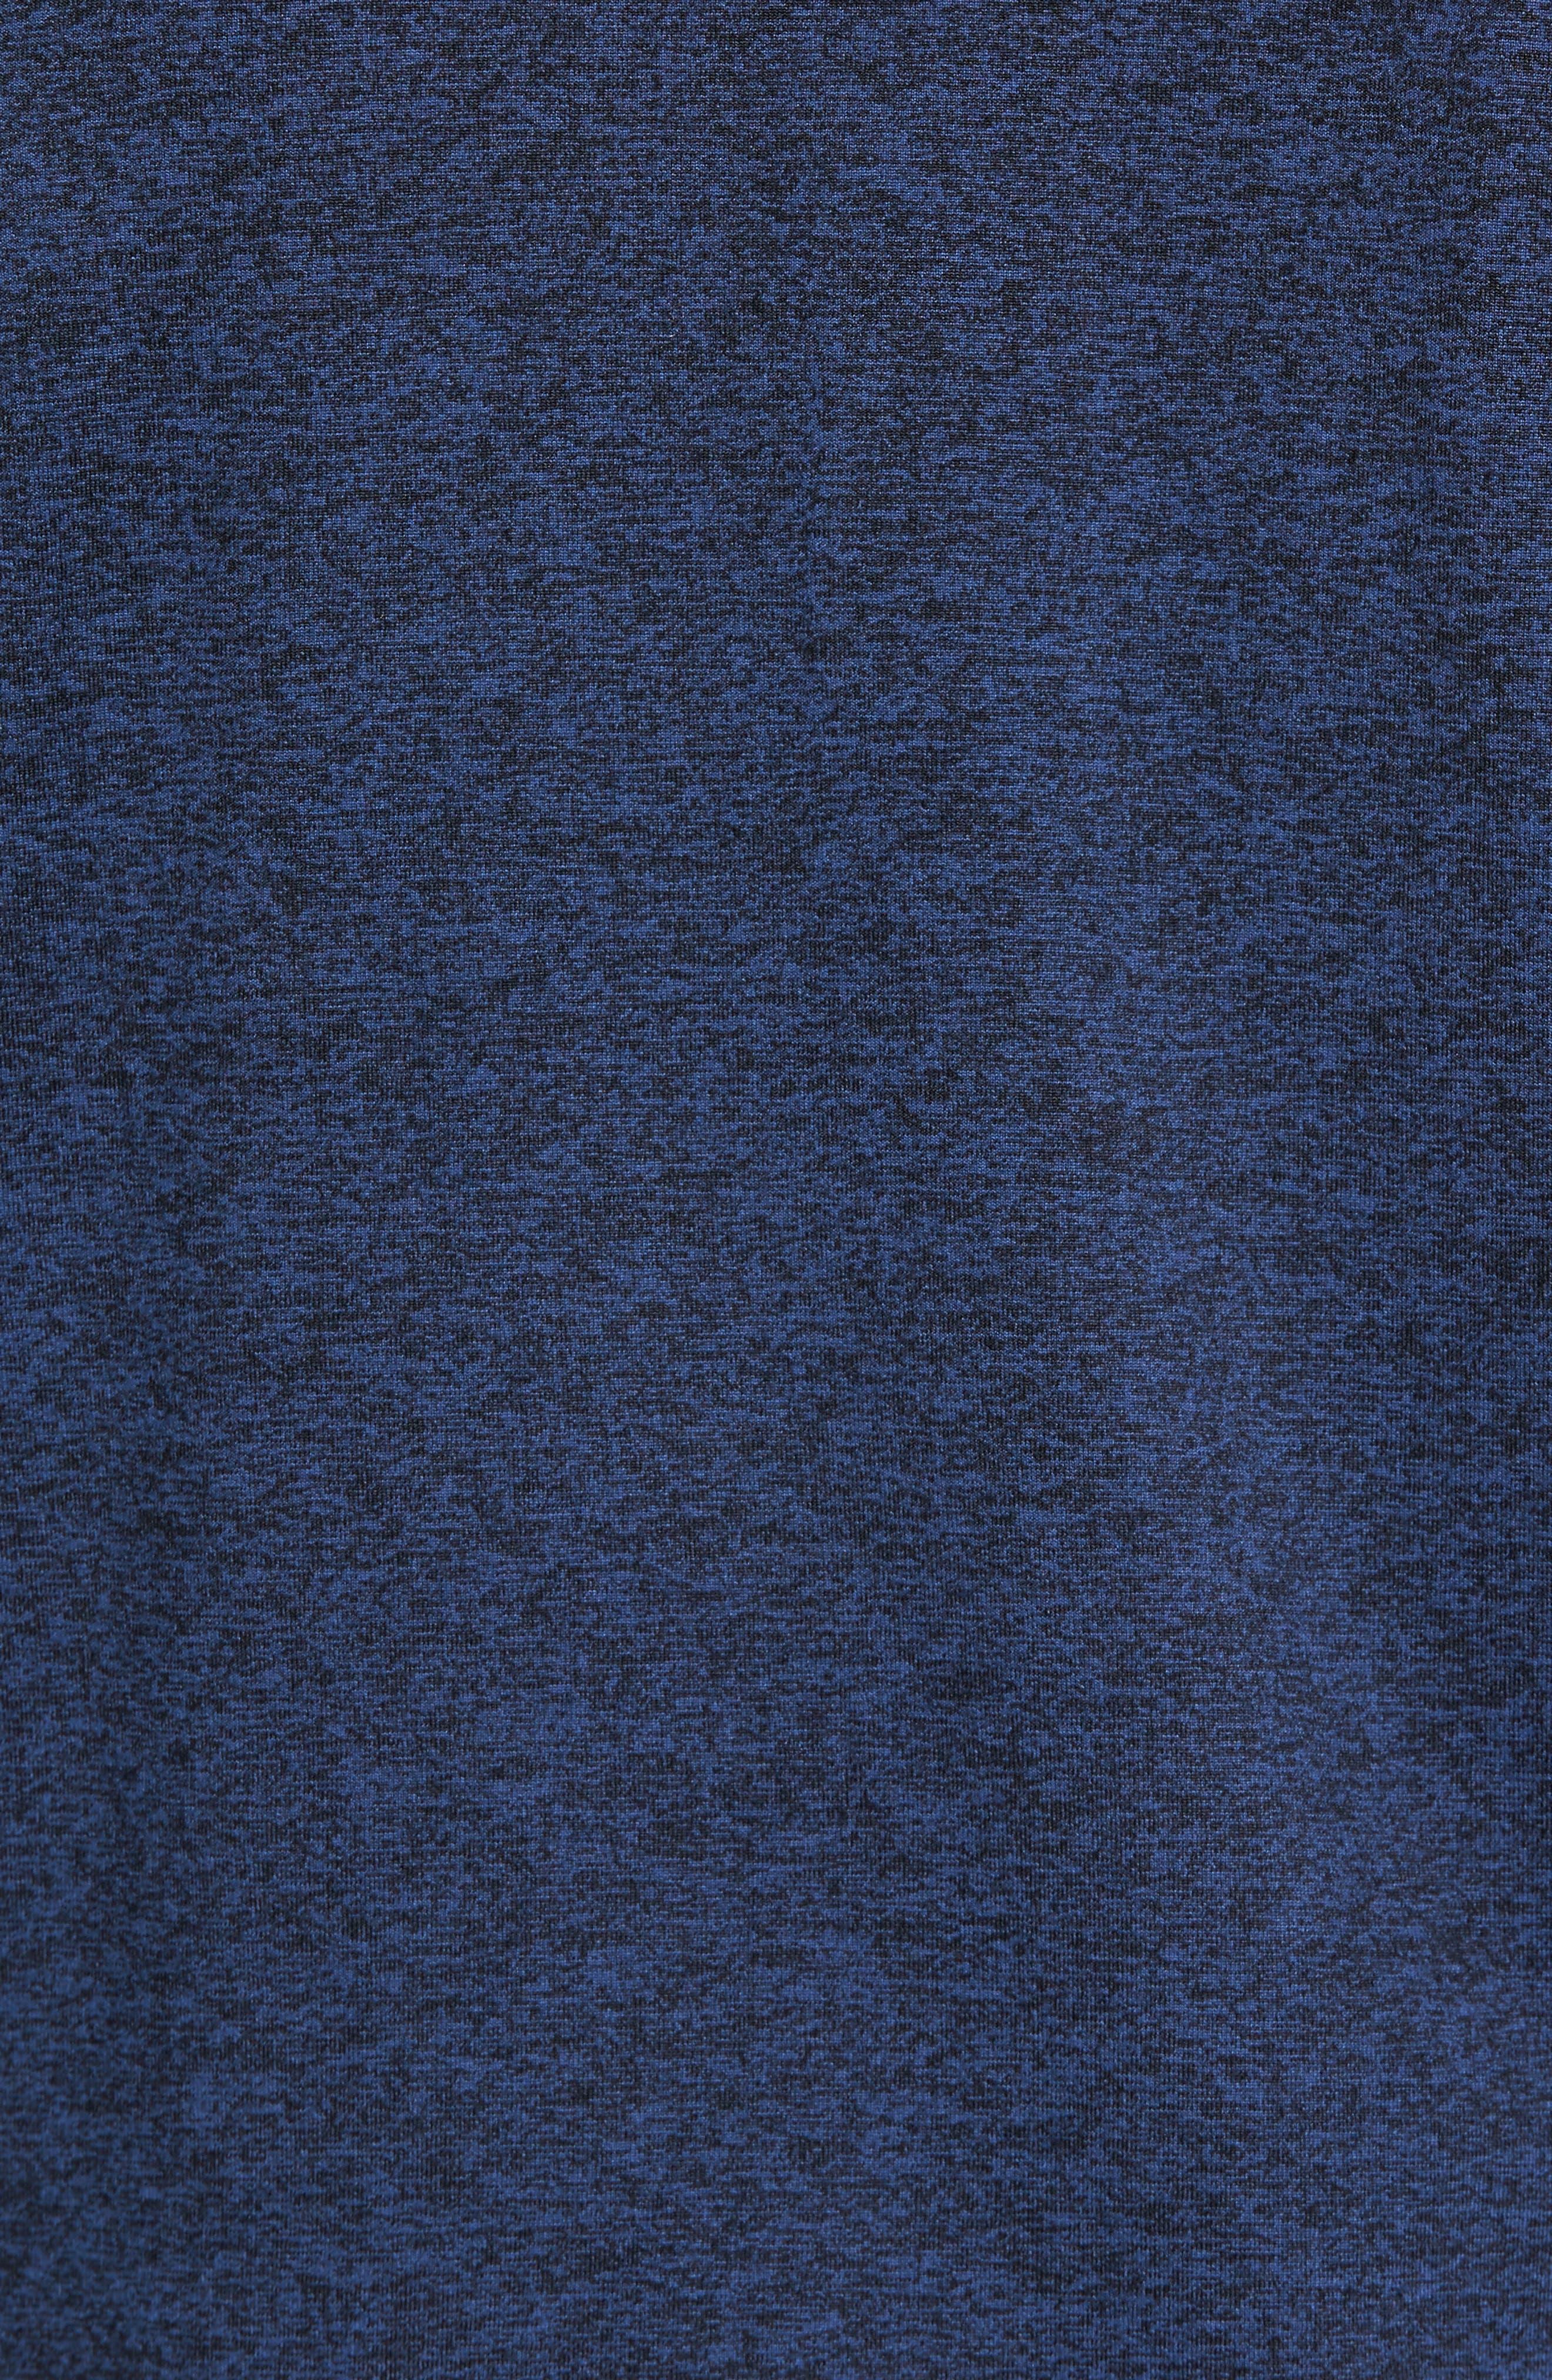 'Elevate' Moisture Wicking Stretch Quarter Zip Pullover,                             Alternate thumbnail 5, color,                             Navy Black/ Black/ White